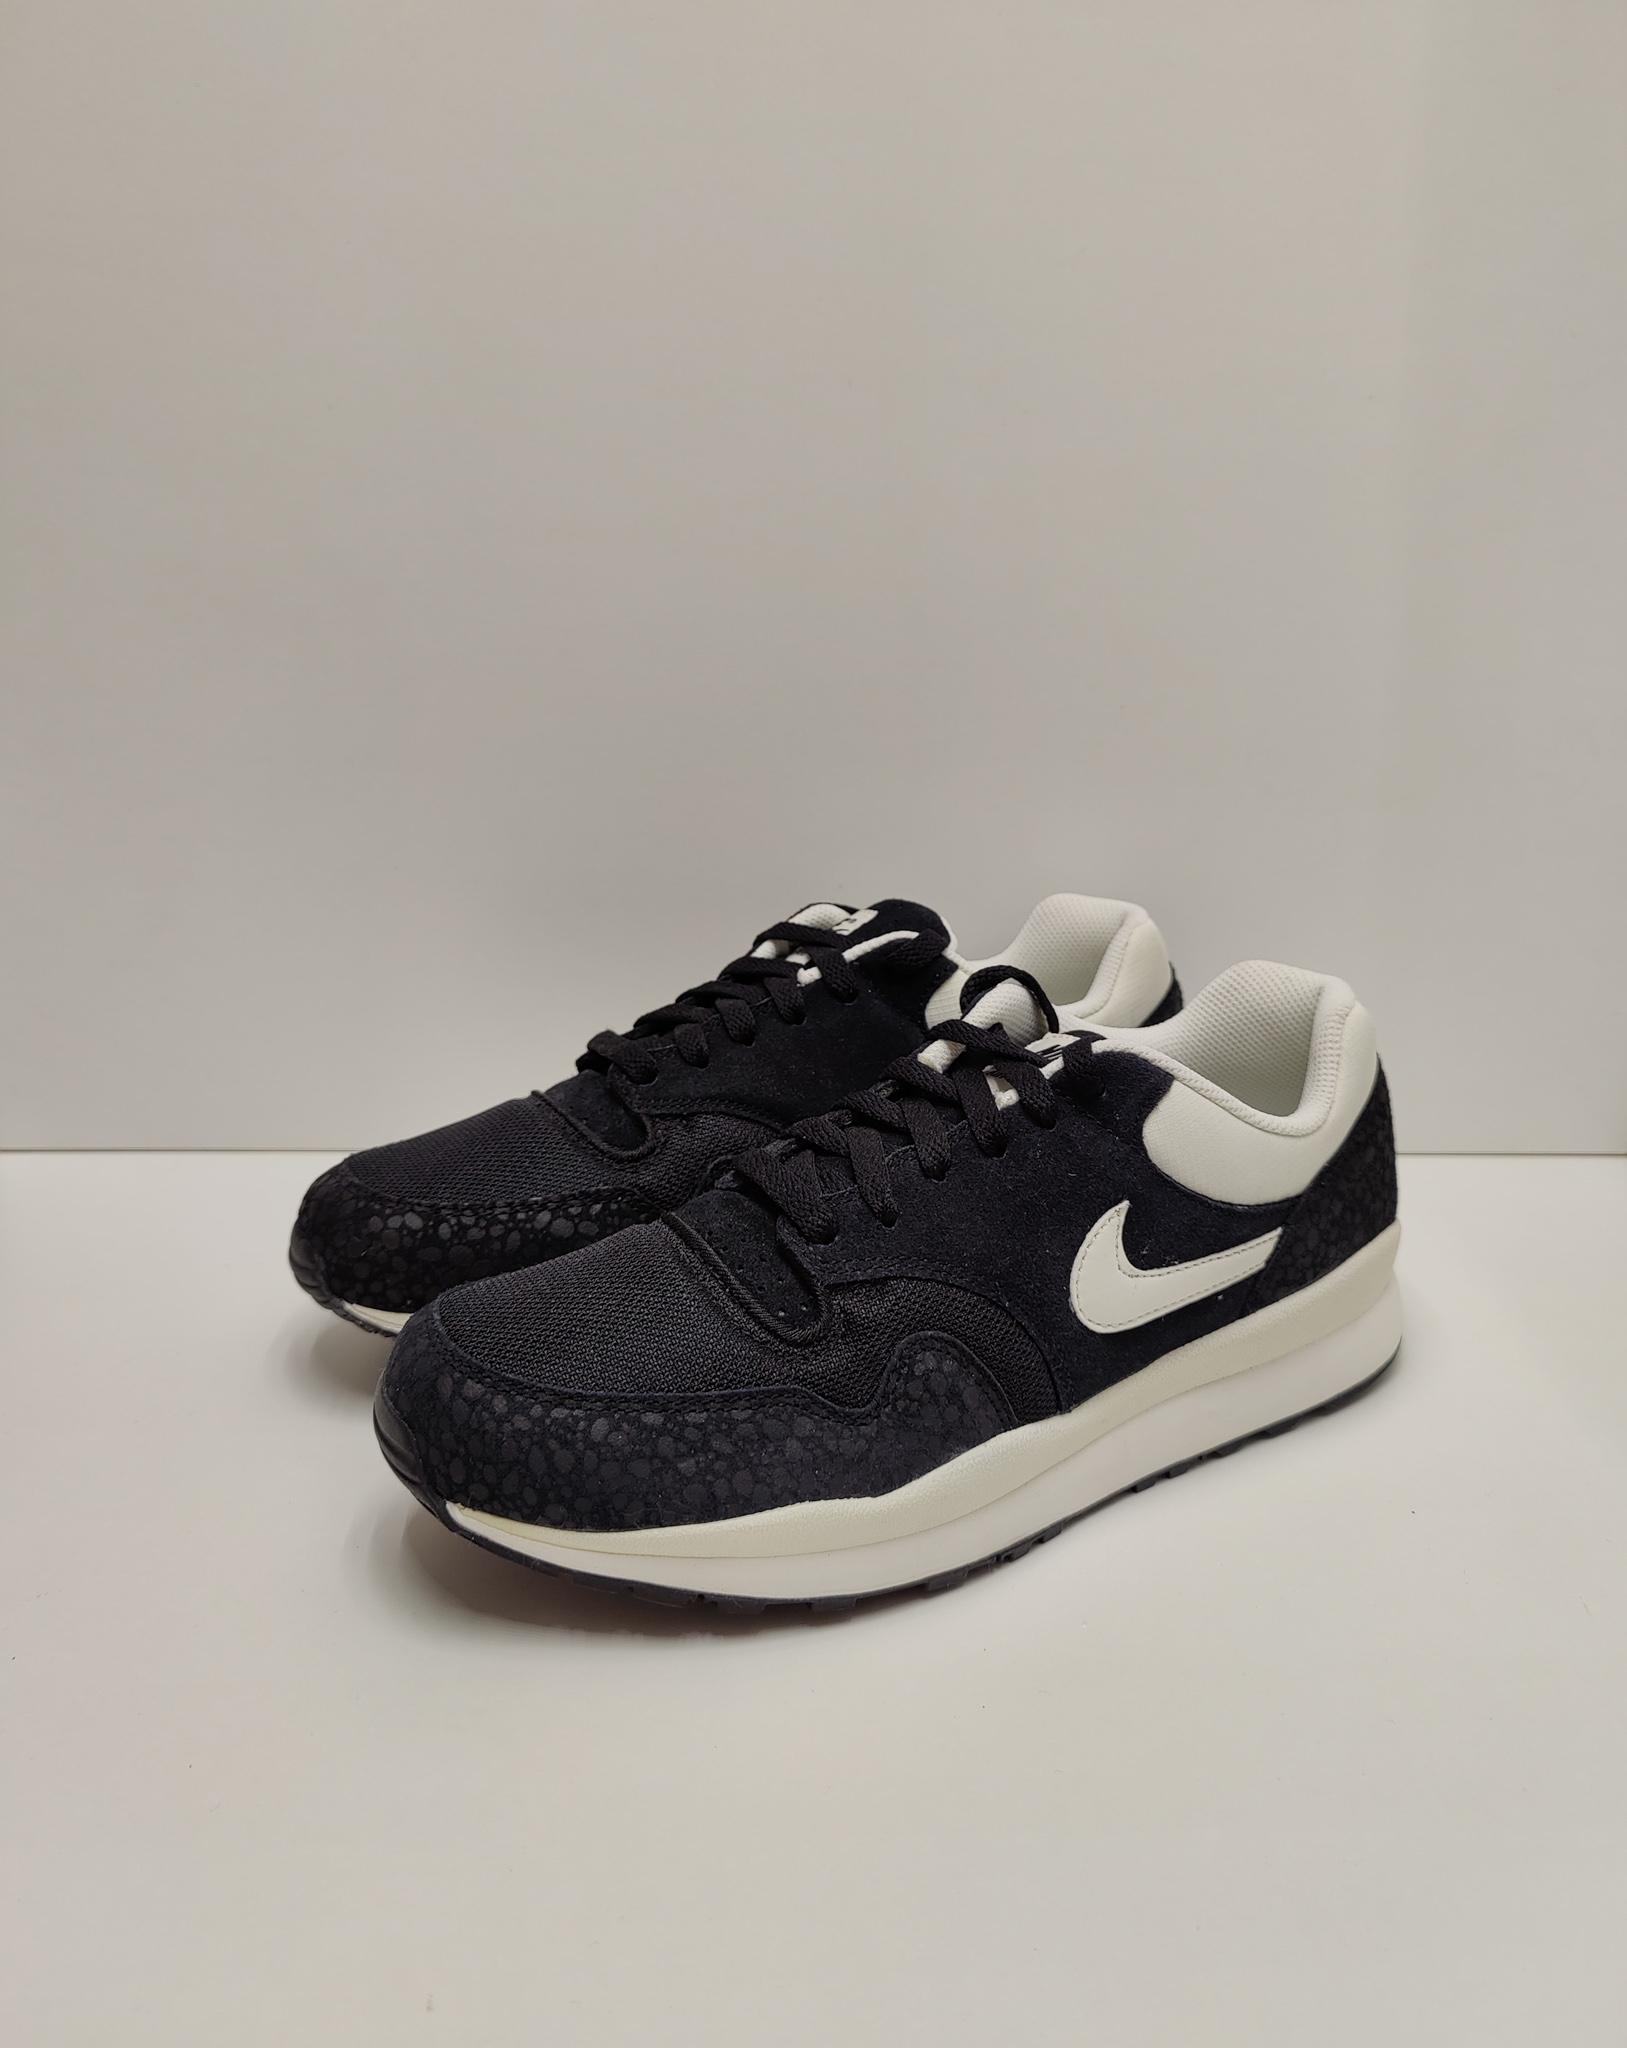 Nike Air Safari Black/Sail